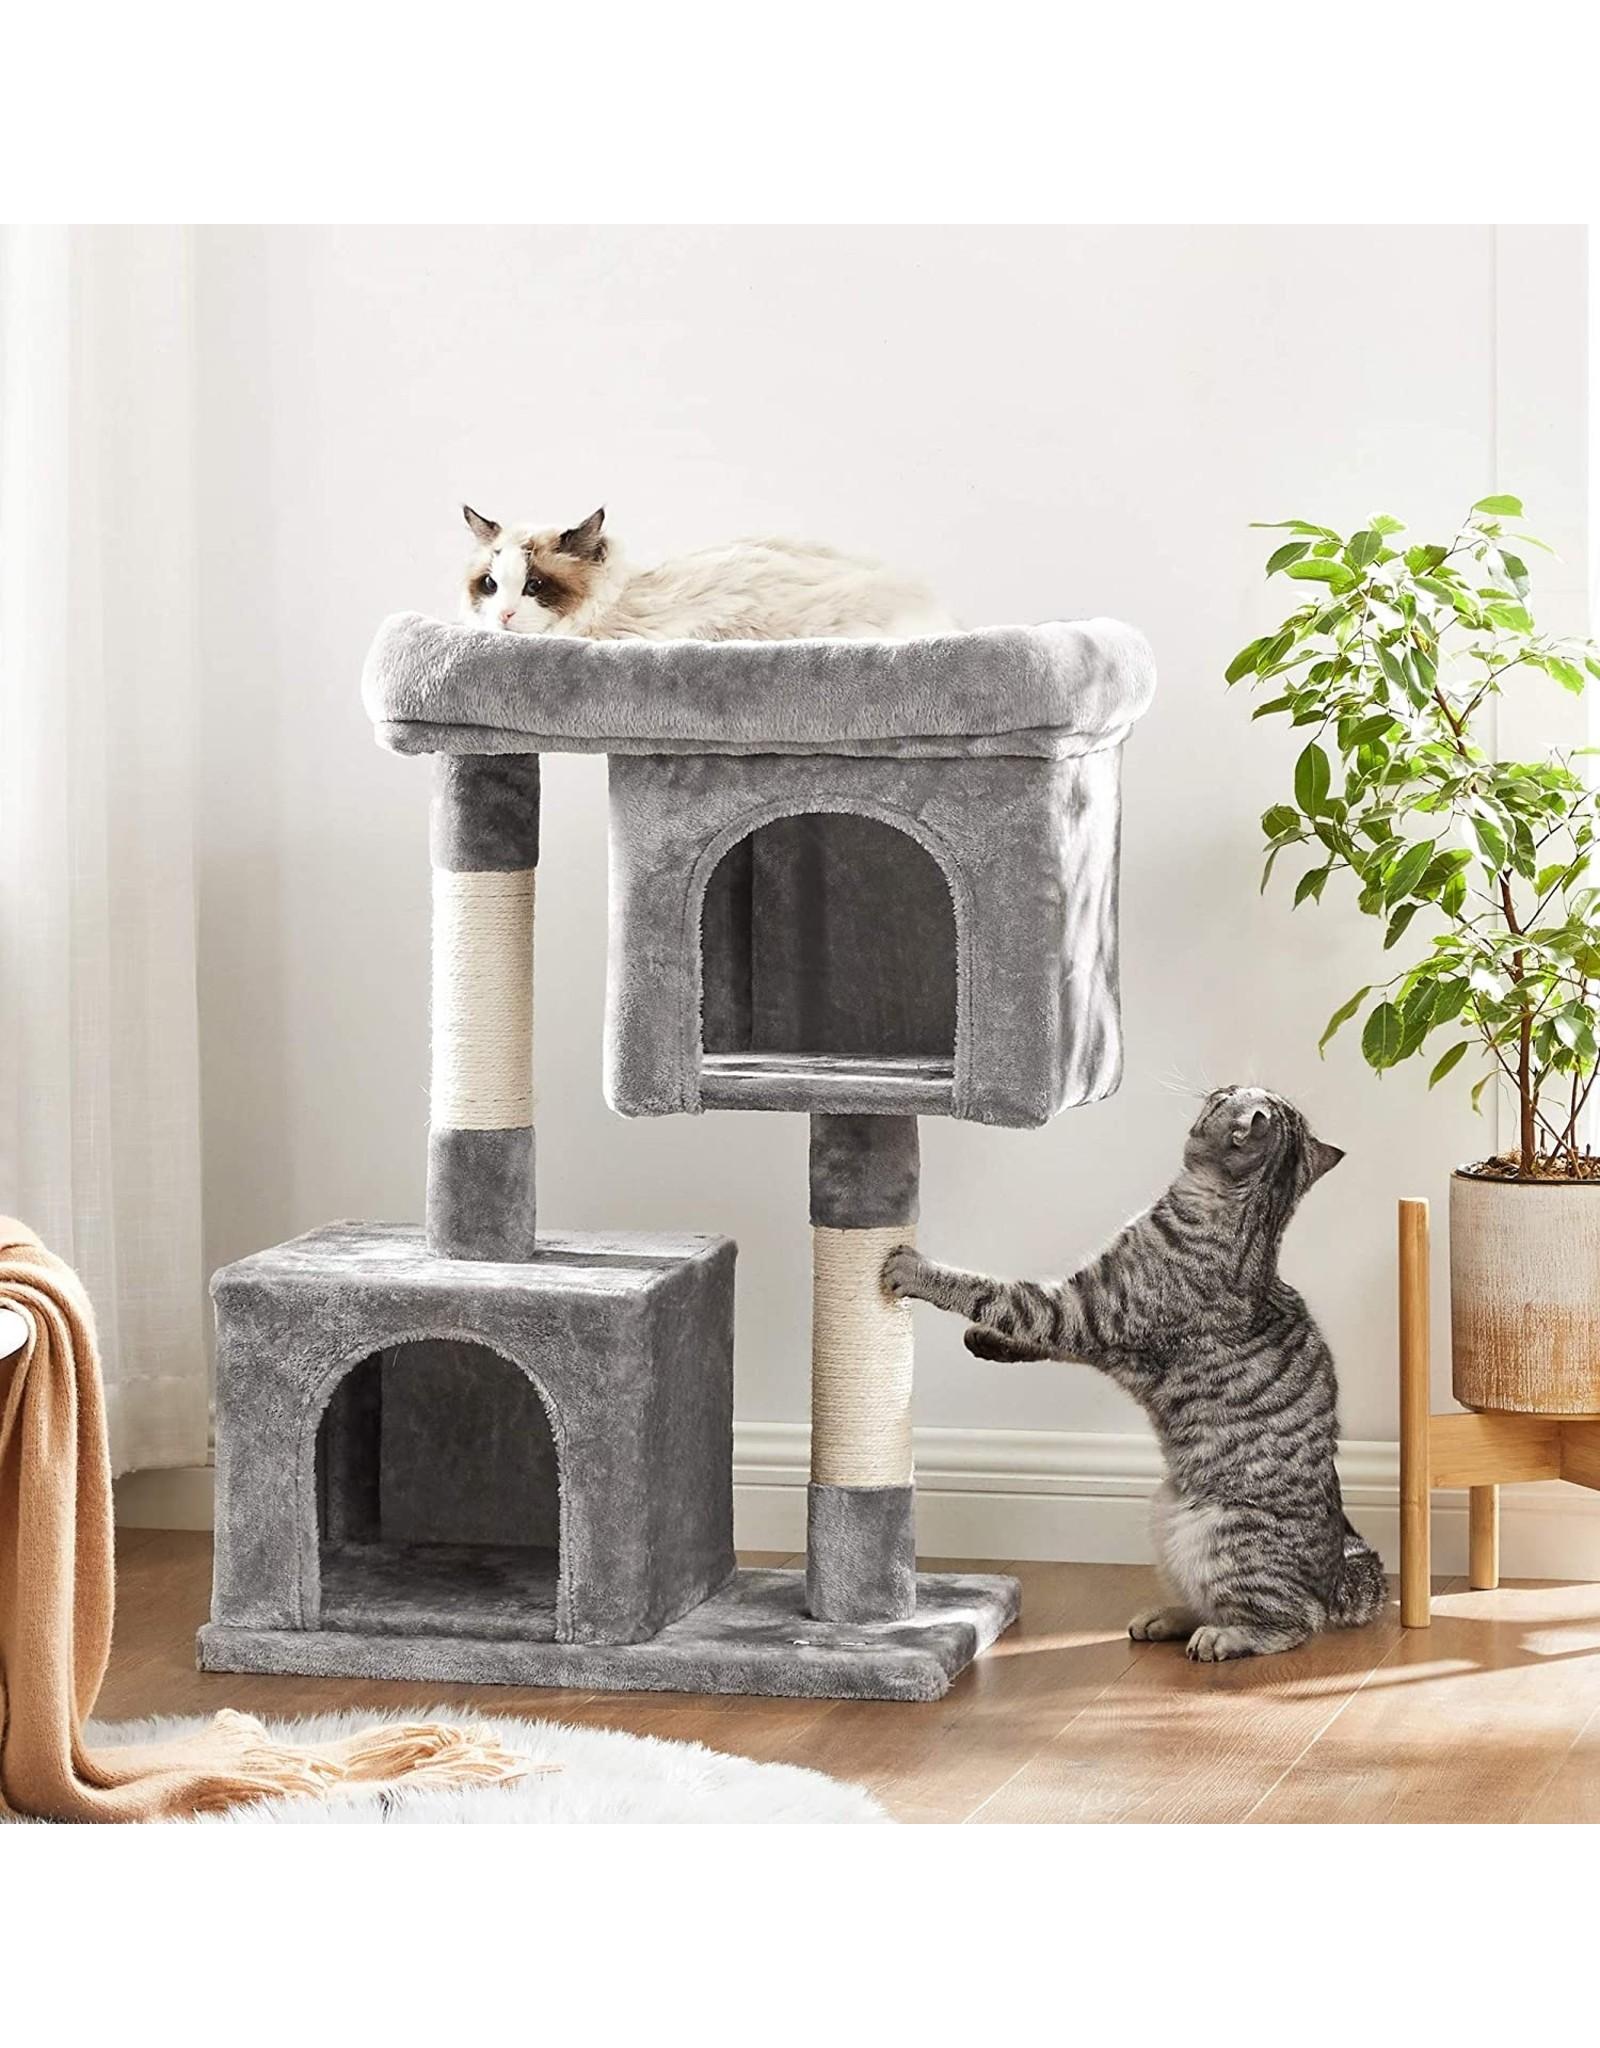 Parya Pets Parya Pets - Kattenboom - Krabpaal - 2 Pluche Condos - Grijs